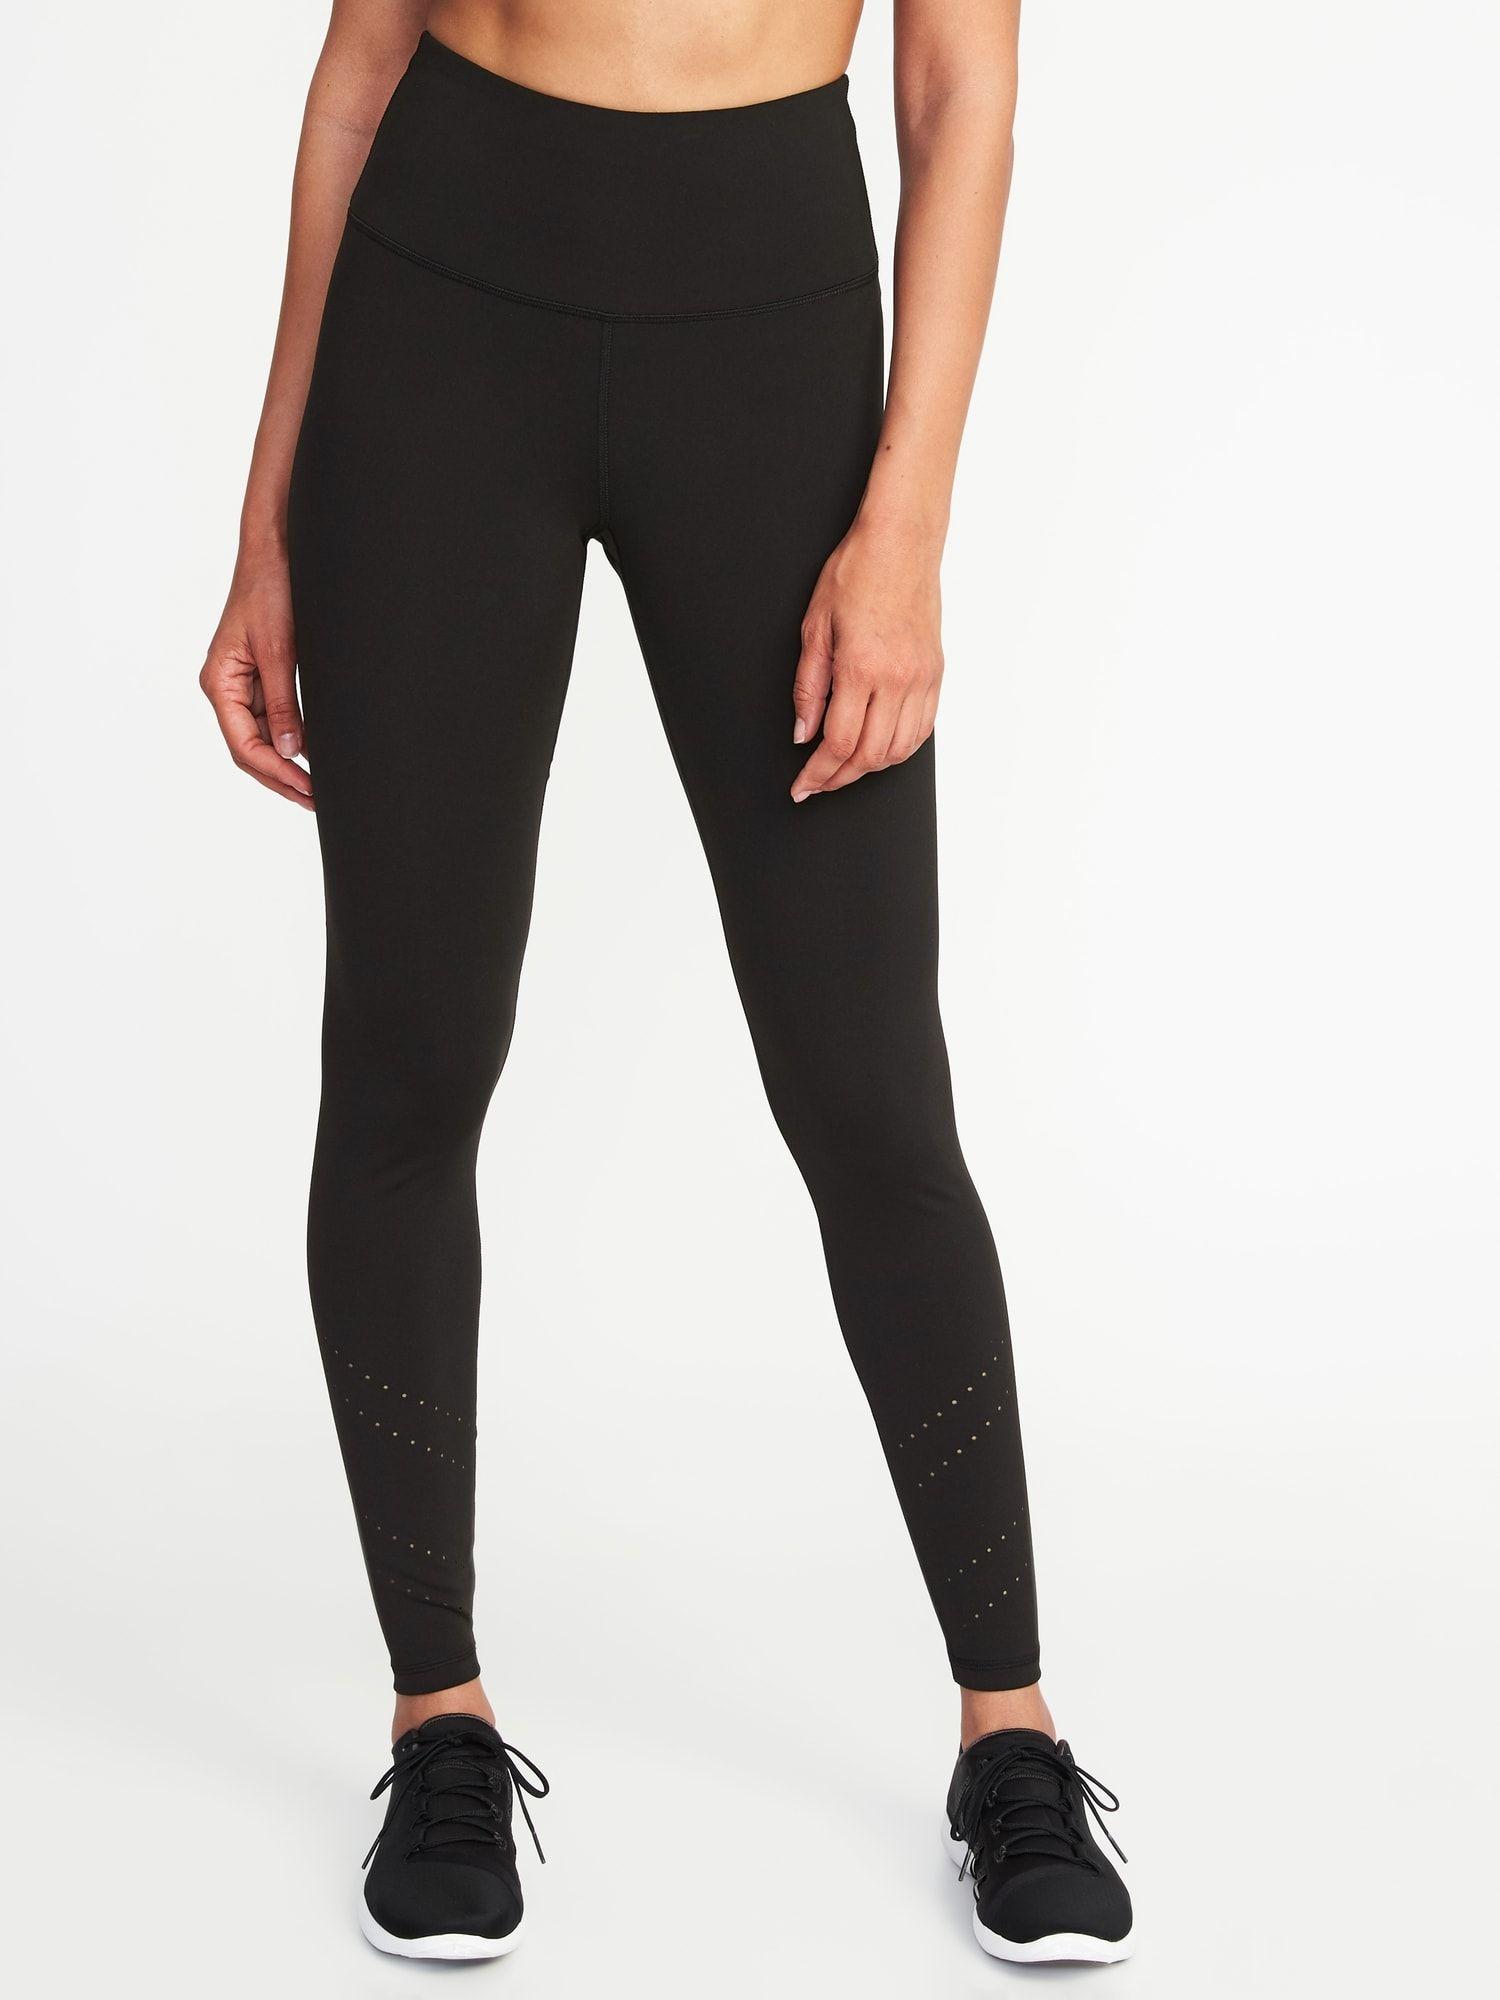 8aca79e1270cc High-Rise 7/8-Length Laser-Cut Compression Leggings for Women in ...